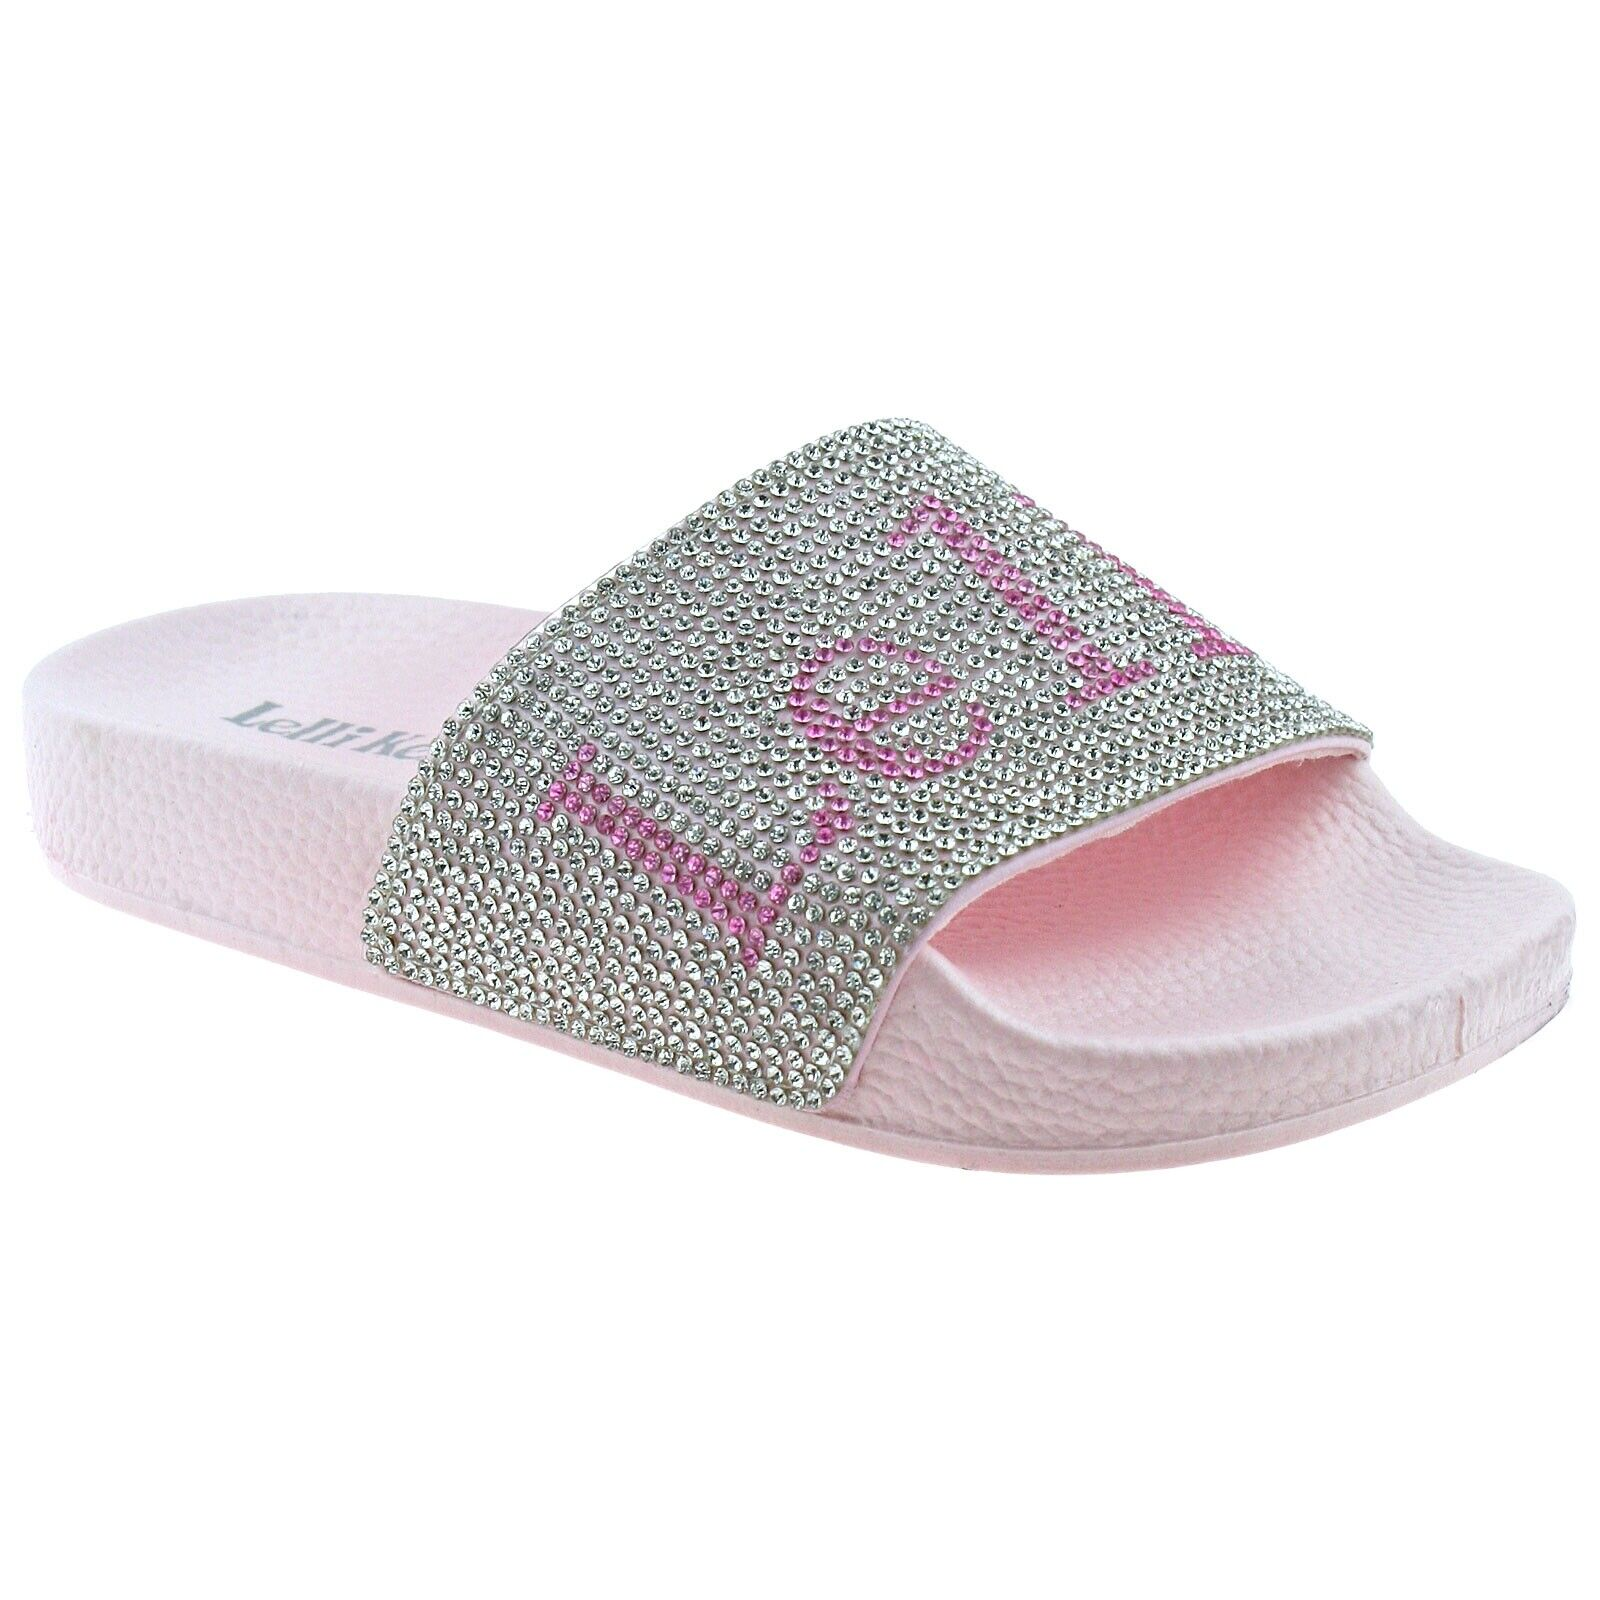 Lelli Kelly MARINA Pink Glitter Slider LK9902 Sizes 28-35